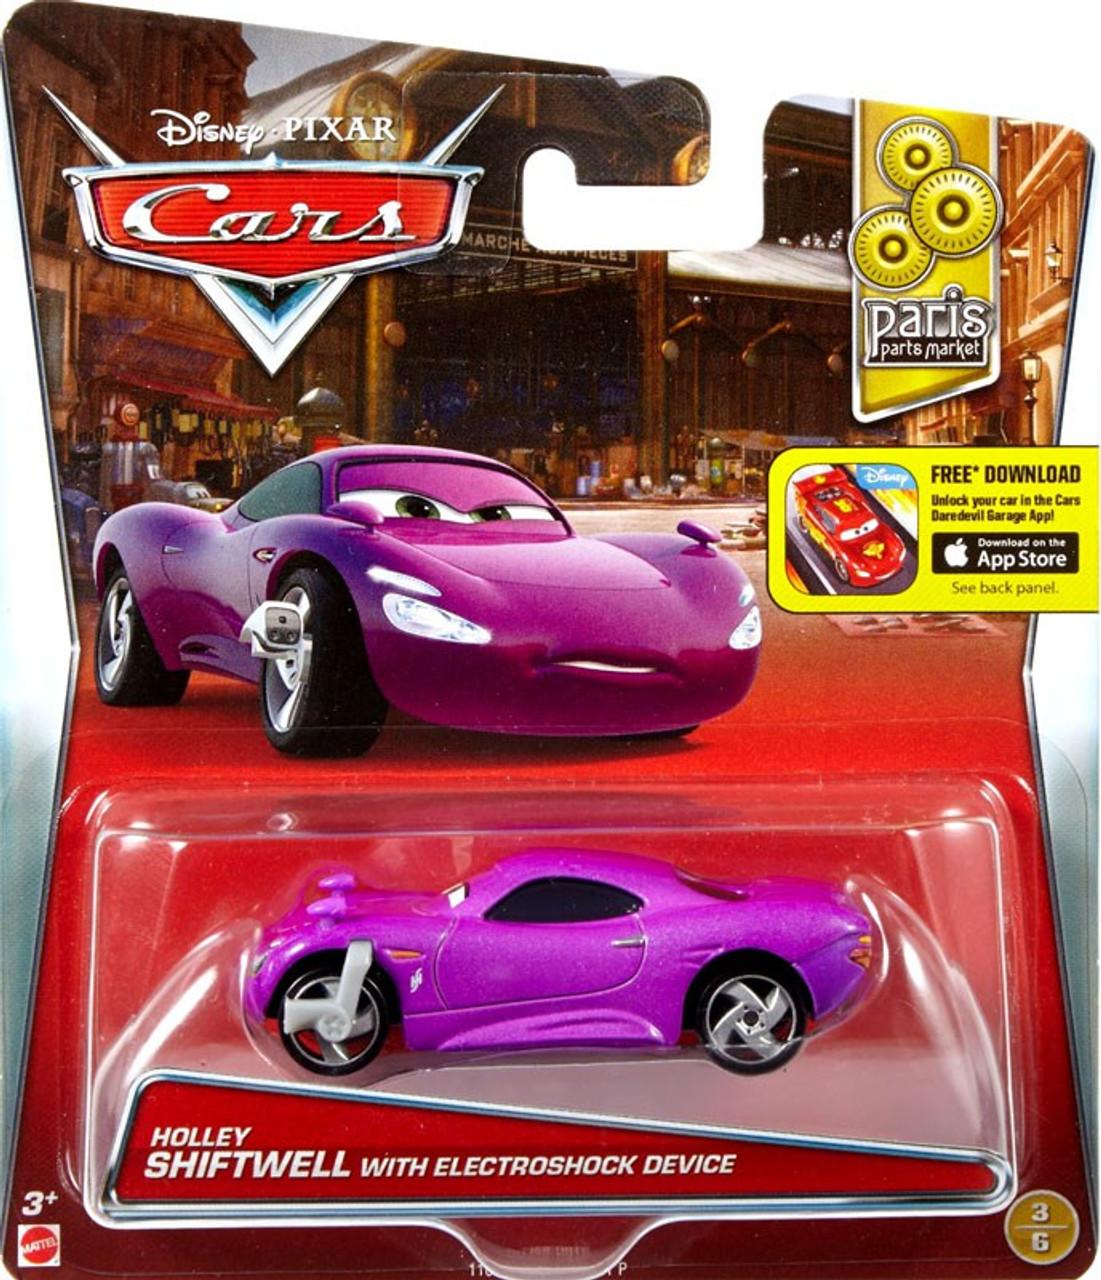 Disney Pixar Cars Paris Parts Market Holley Shiftwell With